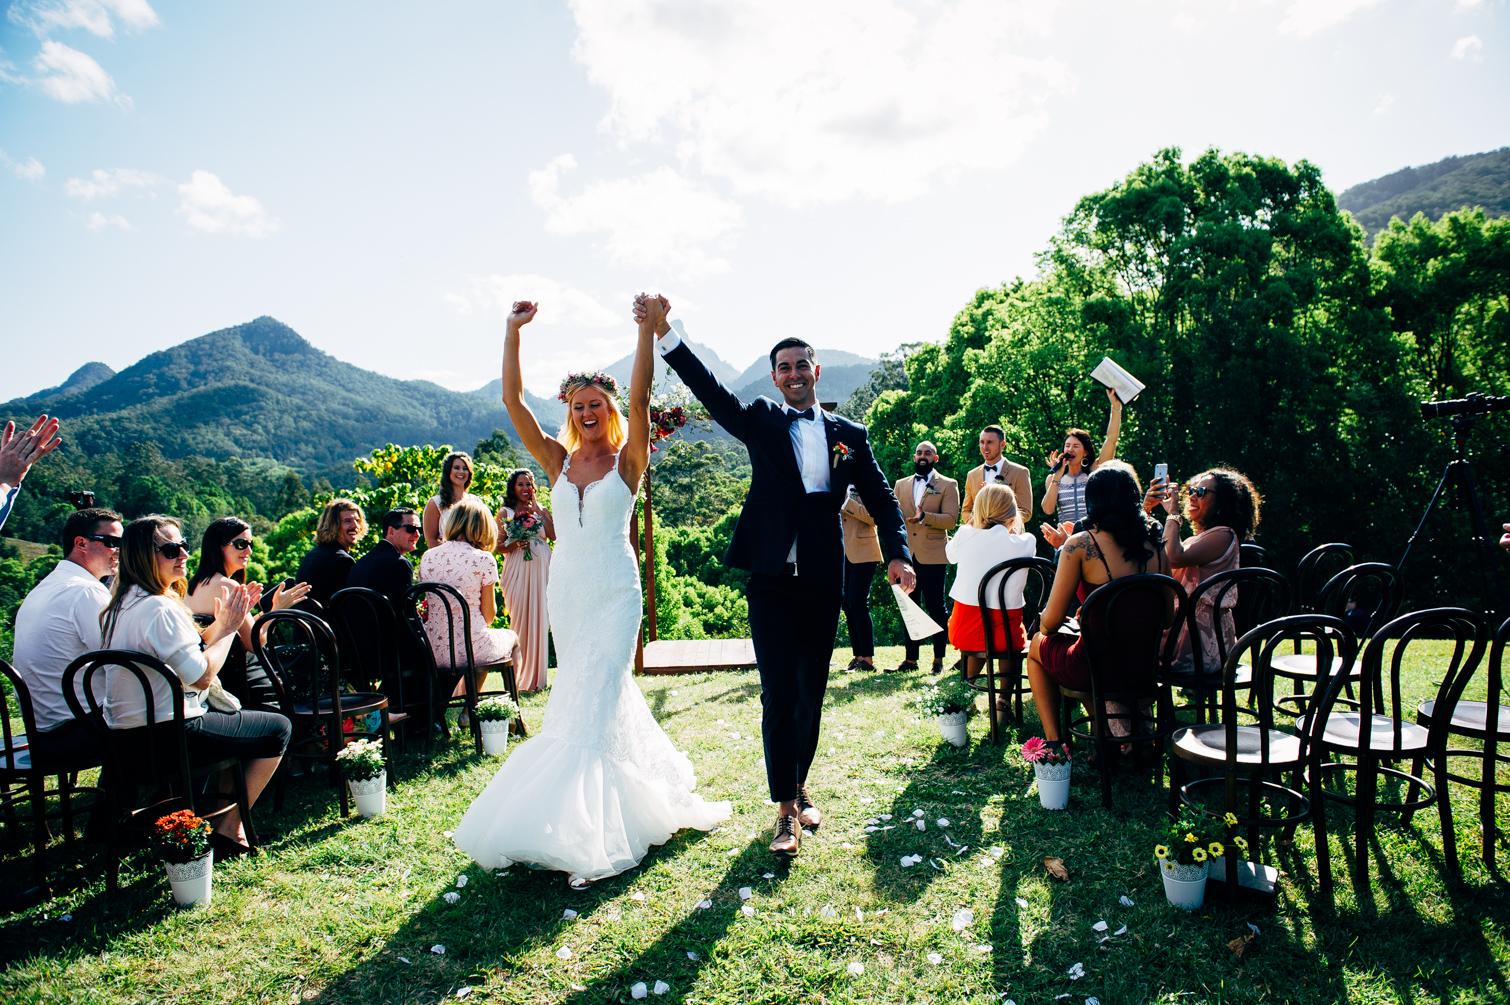 Maviss_kitchen_tipi_wedding venue-25.jpg